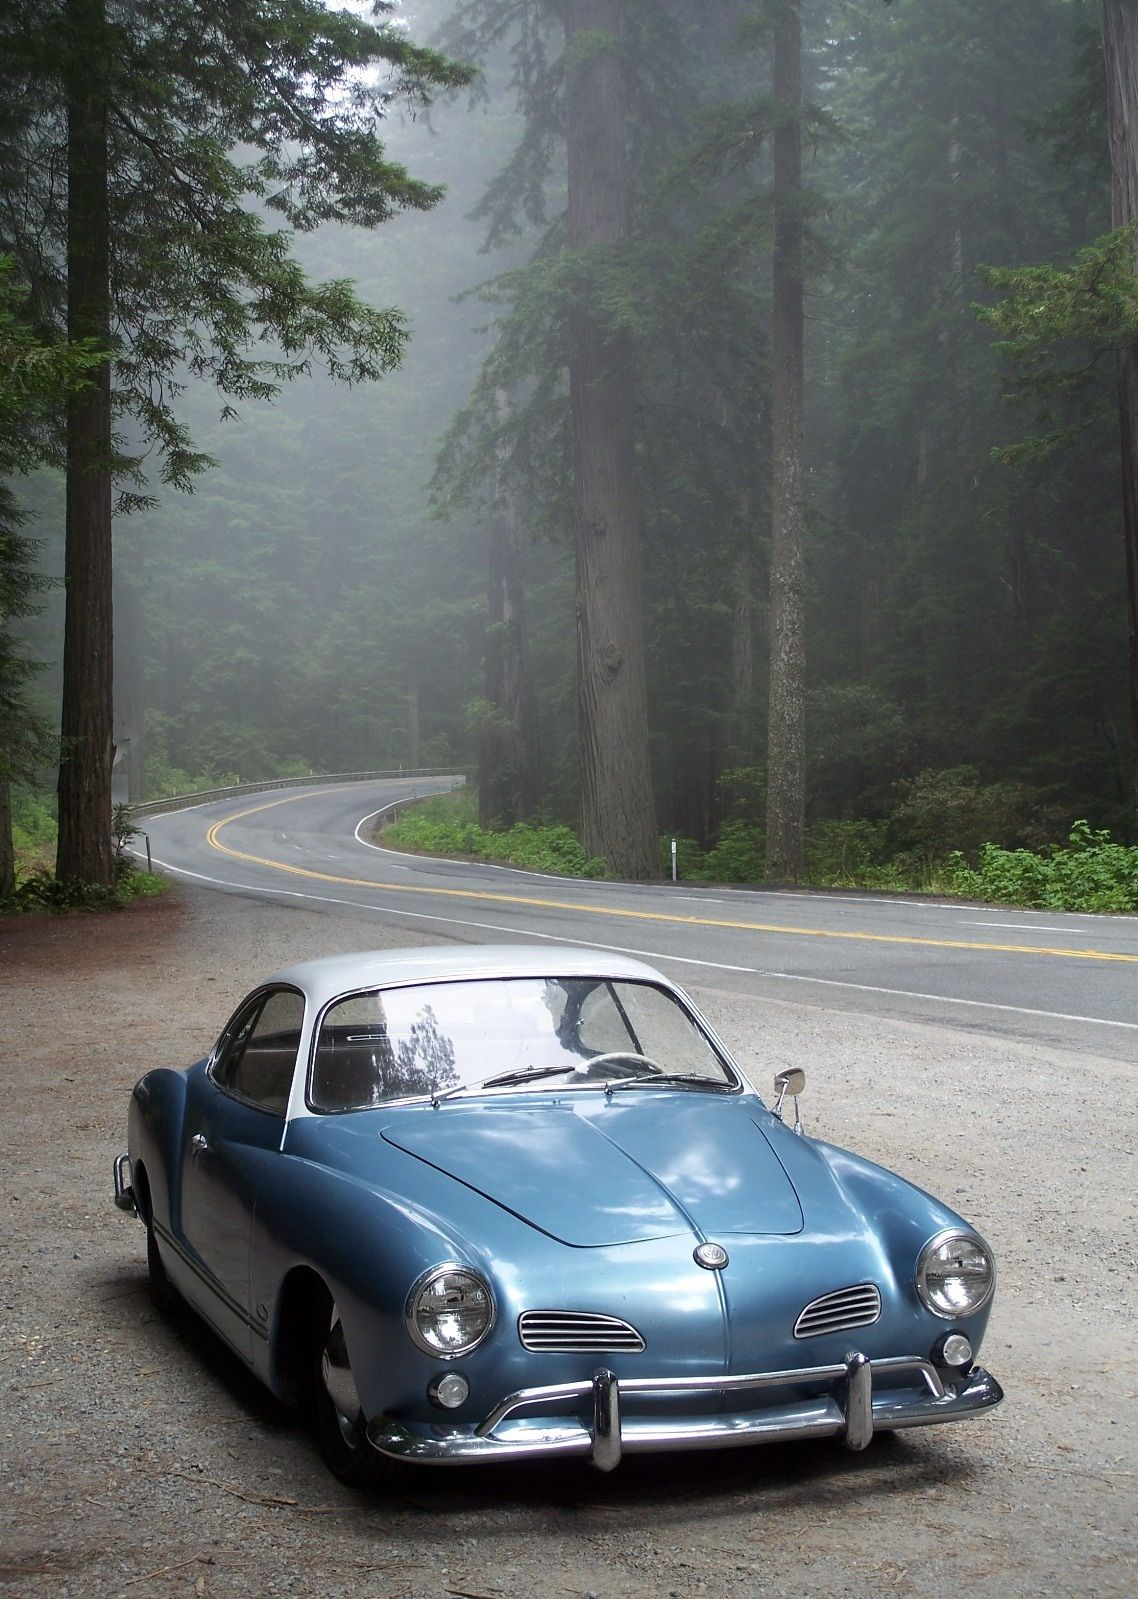 VW Karmann Ghia, 1955 (iainclaridge.net) | Cars, Volkswagen and Beetles